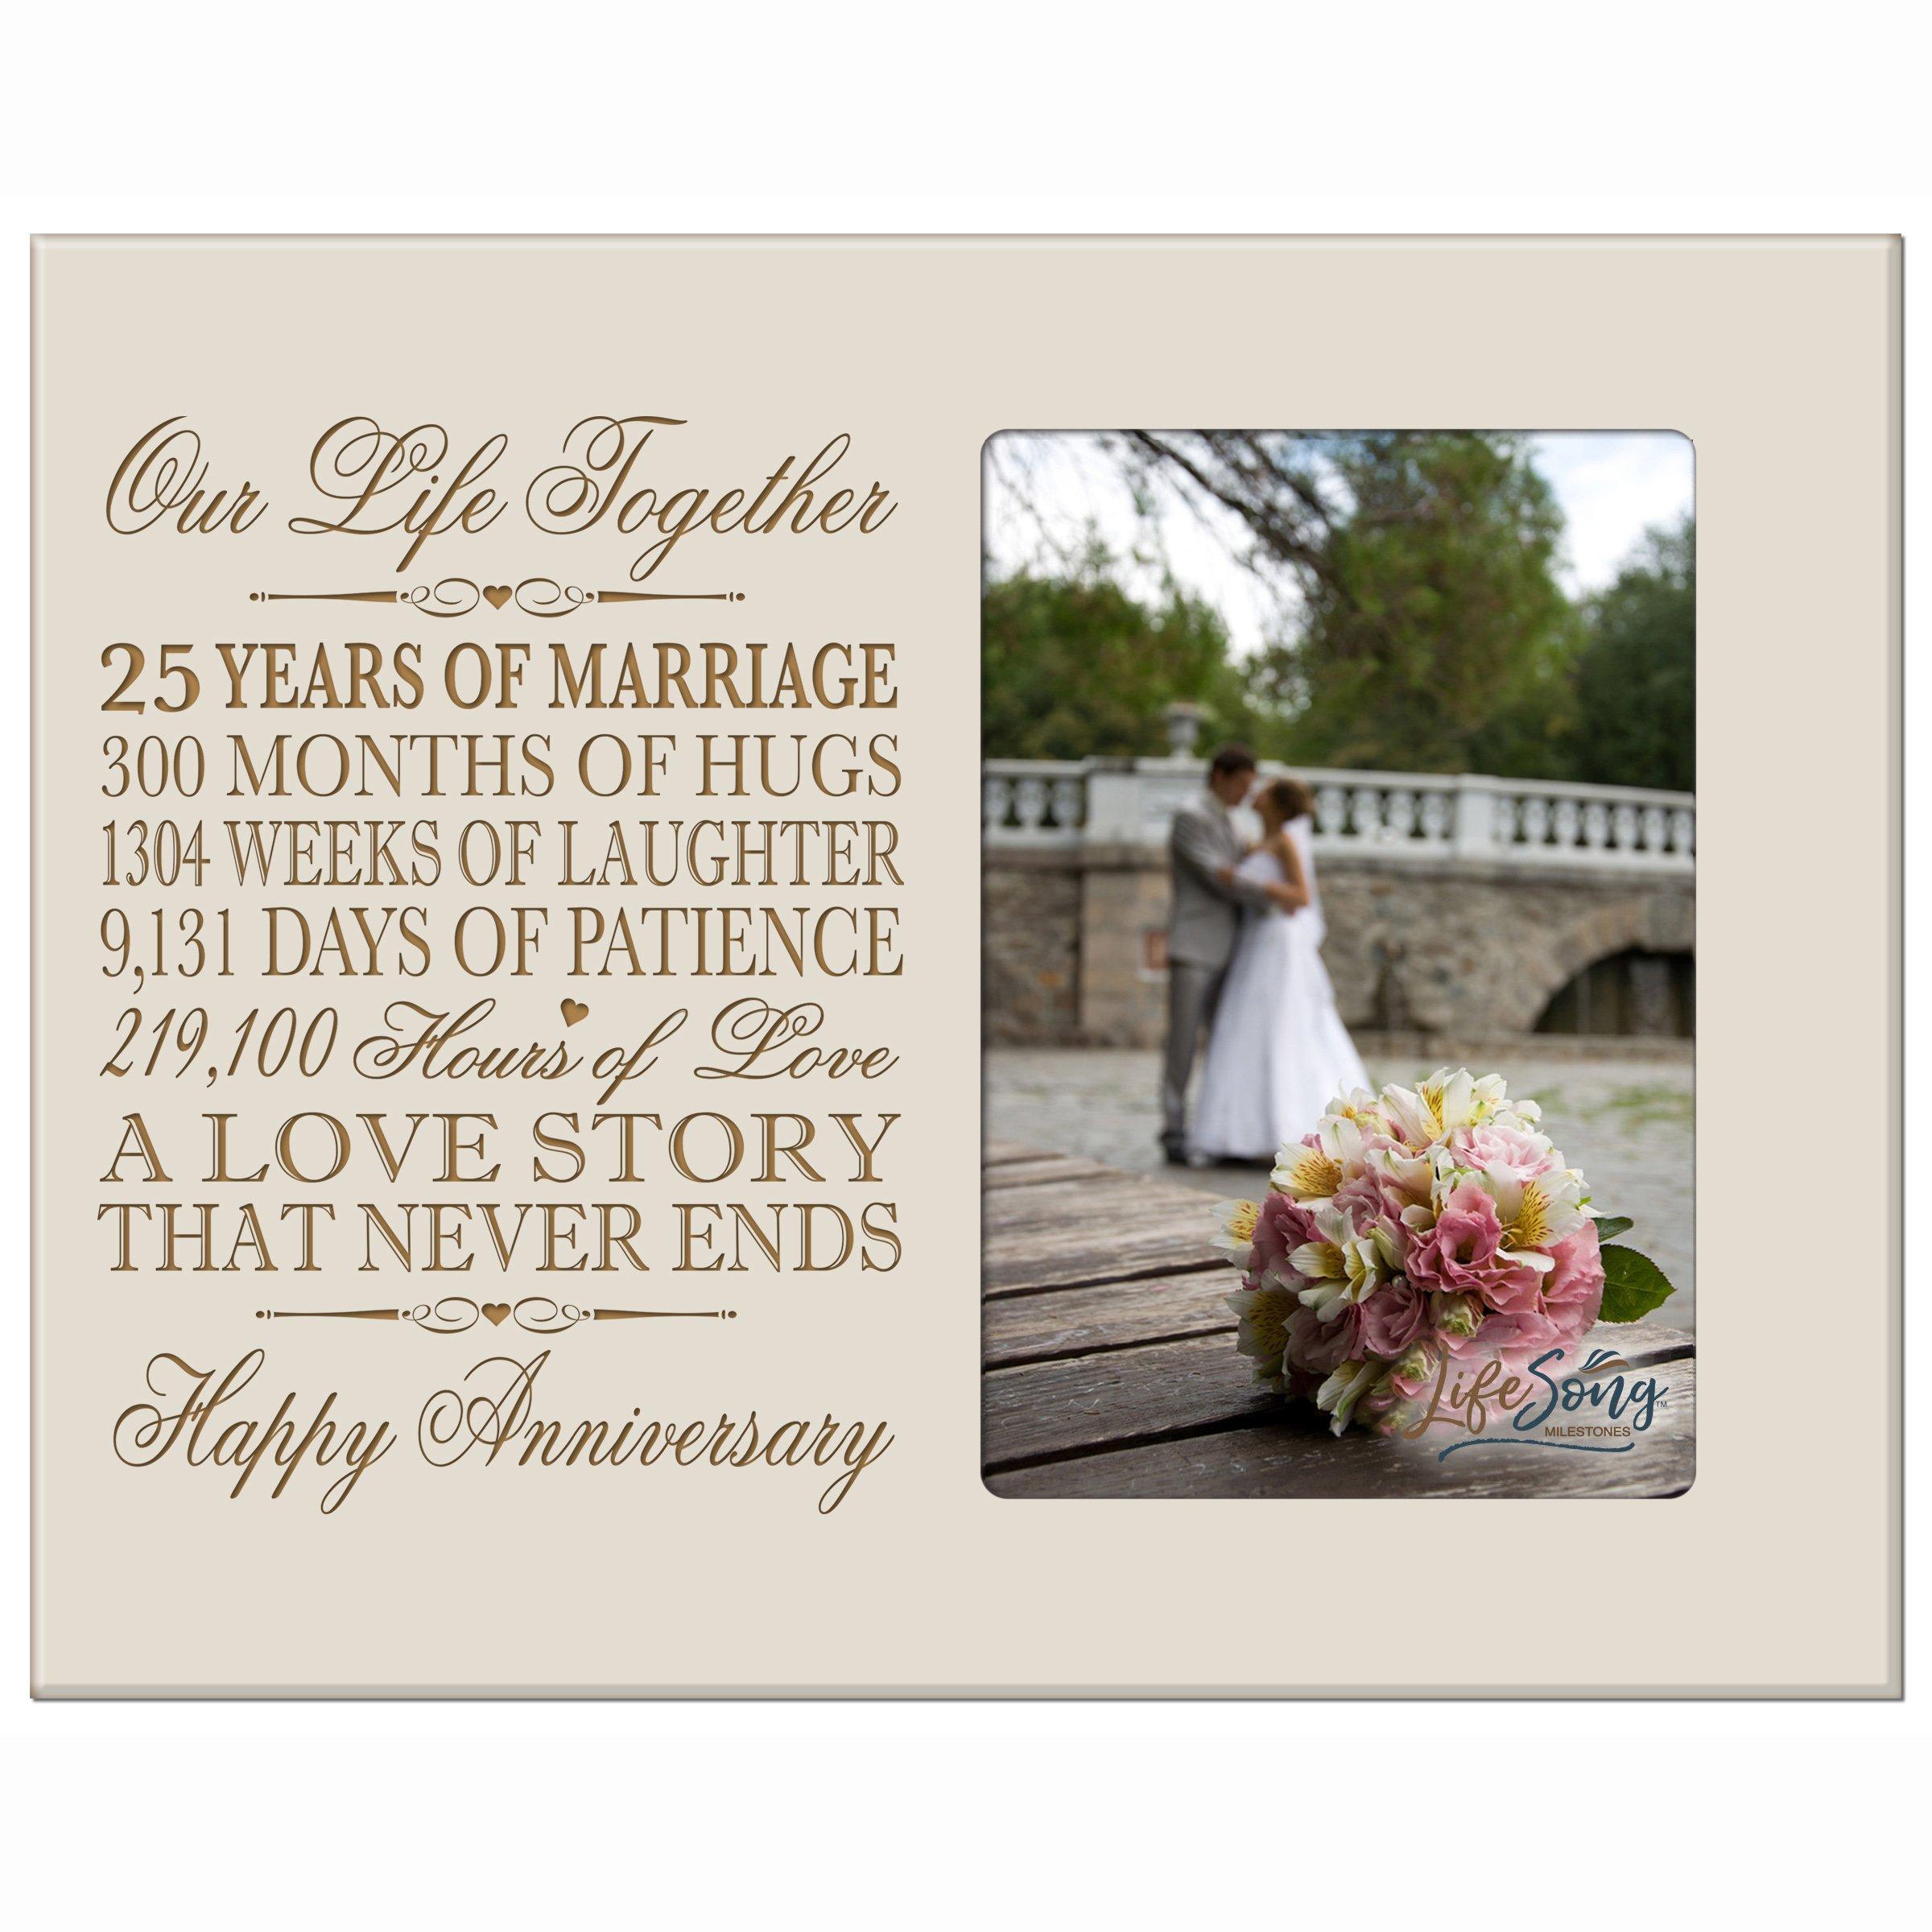 LifeSong Milestones Twenty Five Year for him her Couple Custom Engraved 25th Year Wedding Celebration for Husband Wife Girlfriend Boyfriend Photo Frame Holds 1 4x6 Photo 8'' H X 10'' W (Ivory)